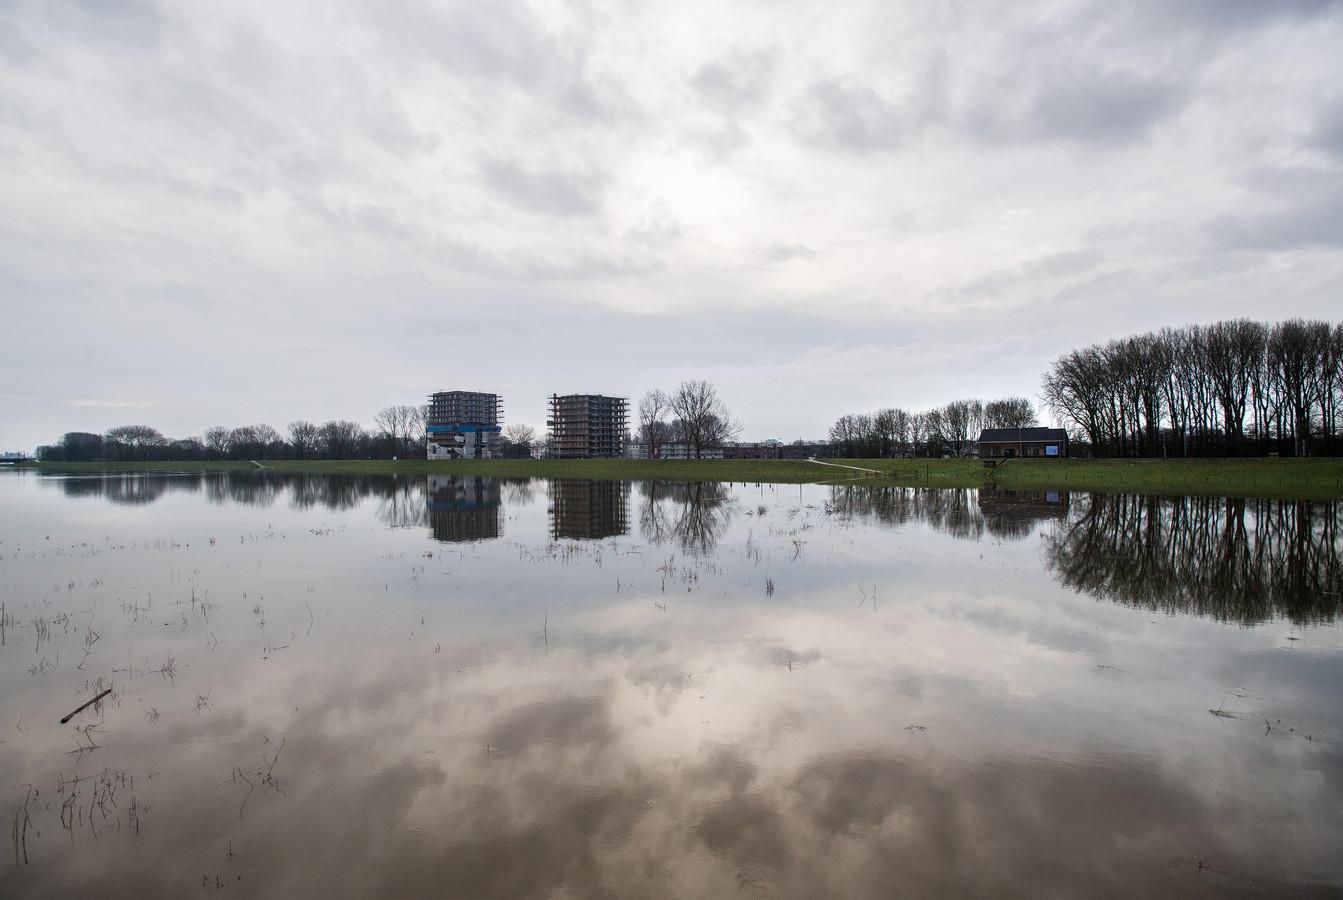 Hoogwater in de 'Groene Rivier' tussen Stadsblokken en Malburgen-West in januari 2018.